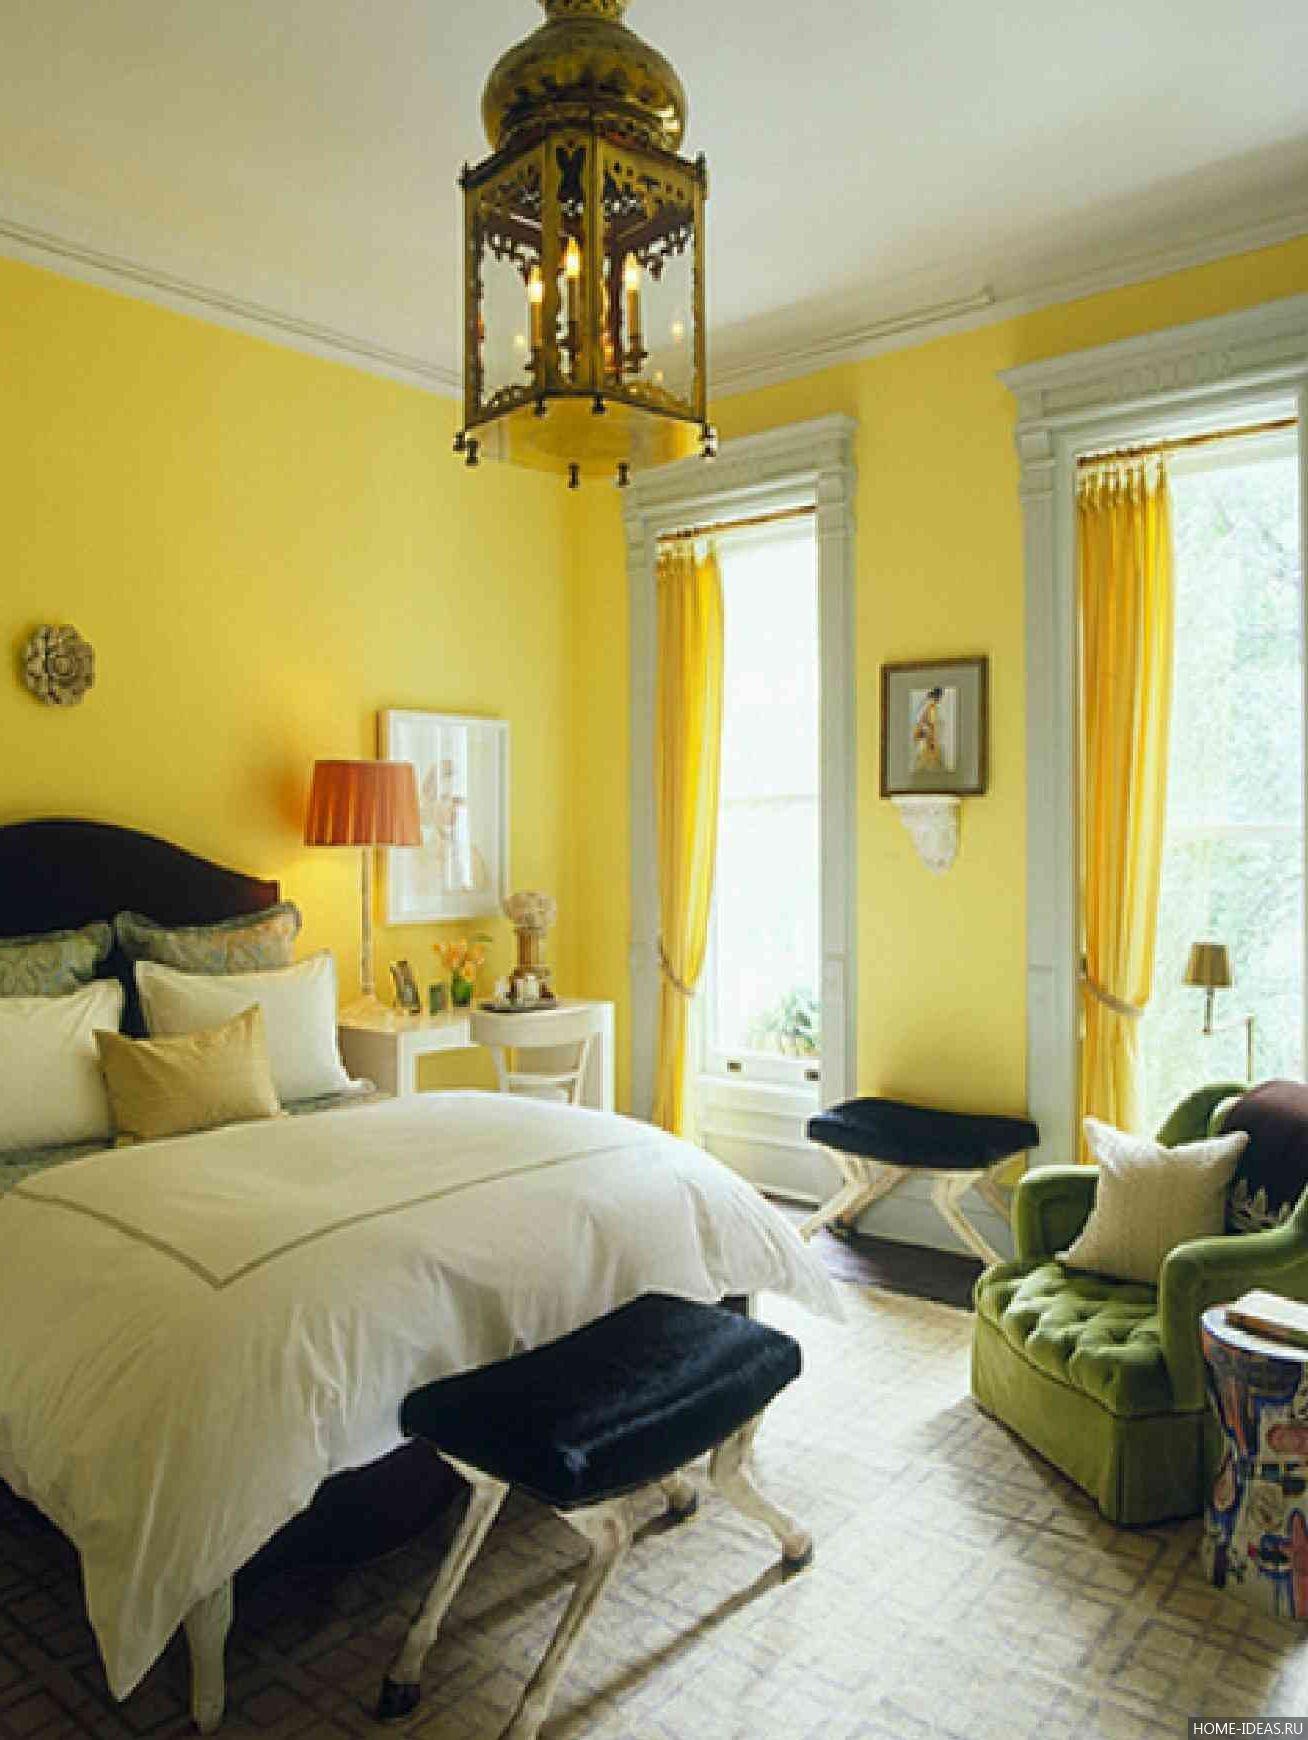 Bedroom Ideas Pinterest, Paint Ideas, Happy House, Interior Designing, Feng